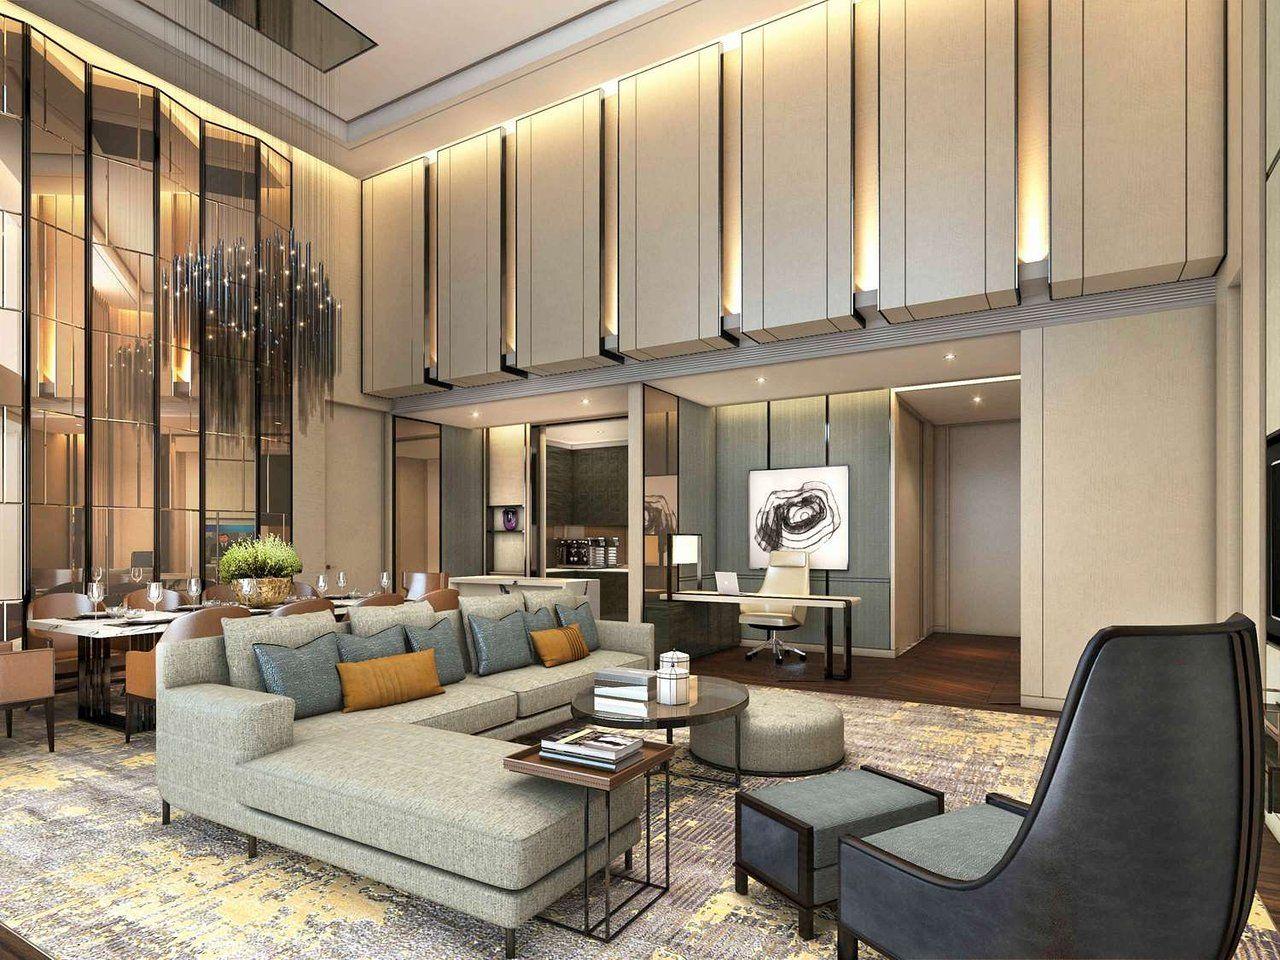 Sofitel Singapore City Centre Updated 2018 Hotel Reviews Price Comparison And 562 Photos Tripadvisor Interior Desain Interior Rumah Desain Interior